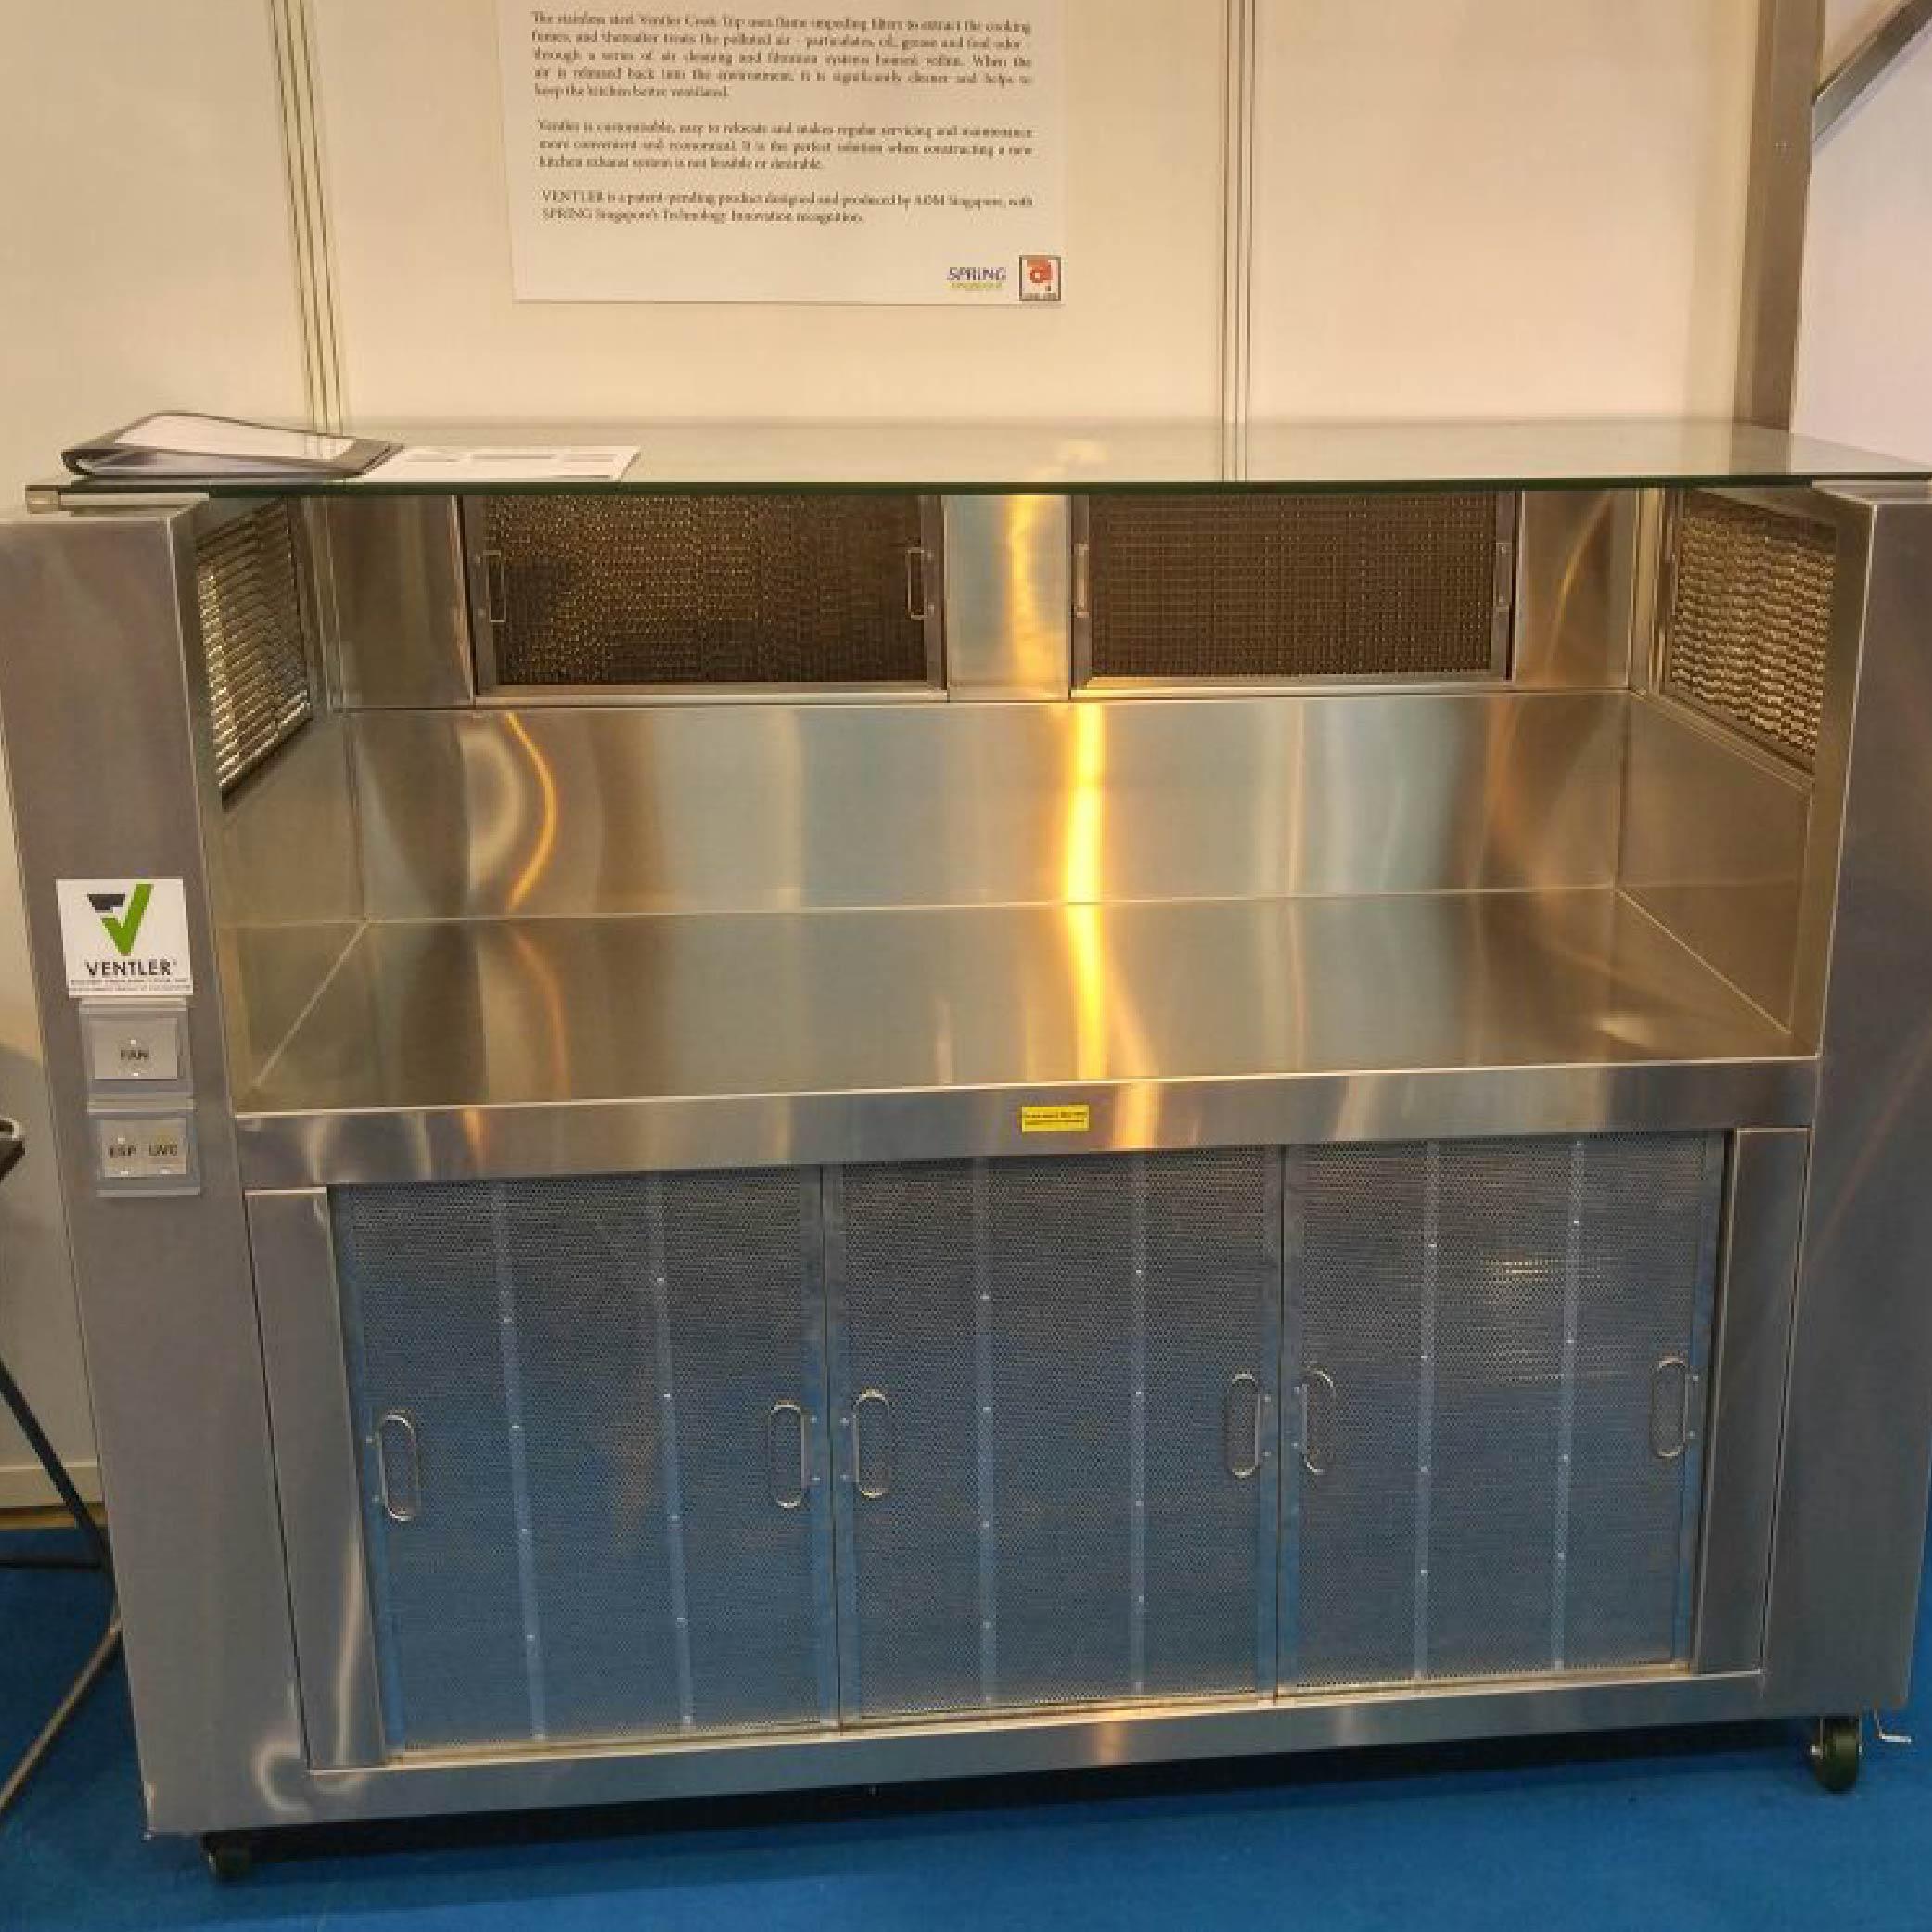 Ventler Cook Top on display